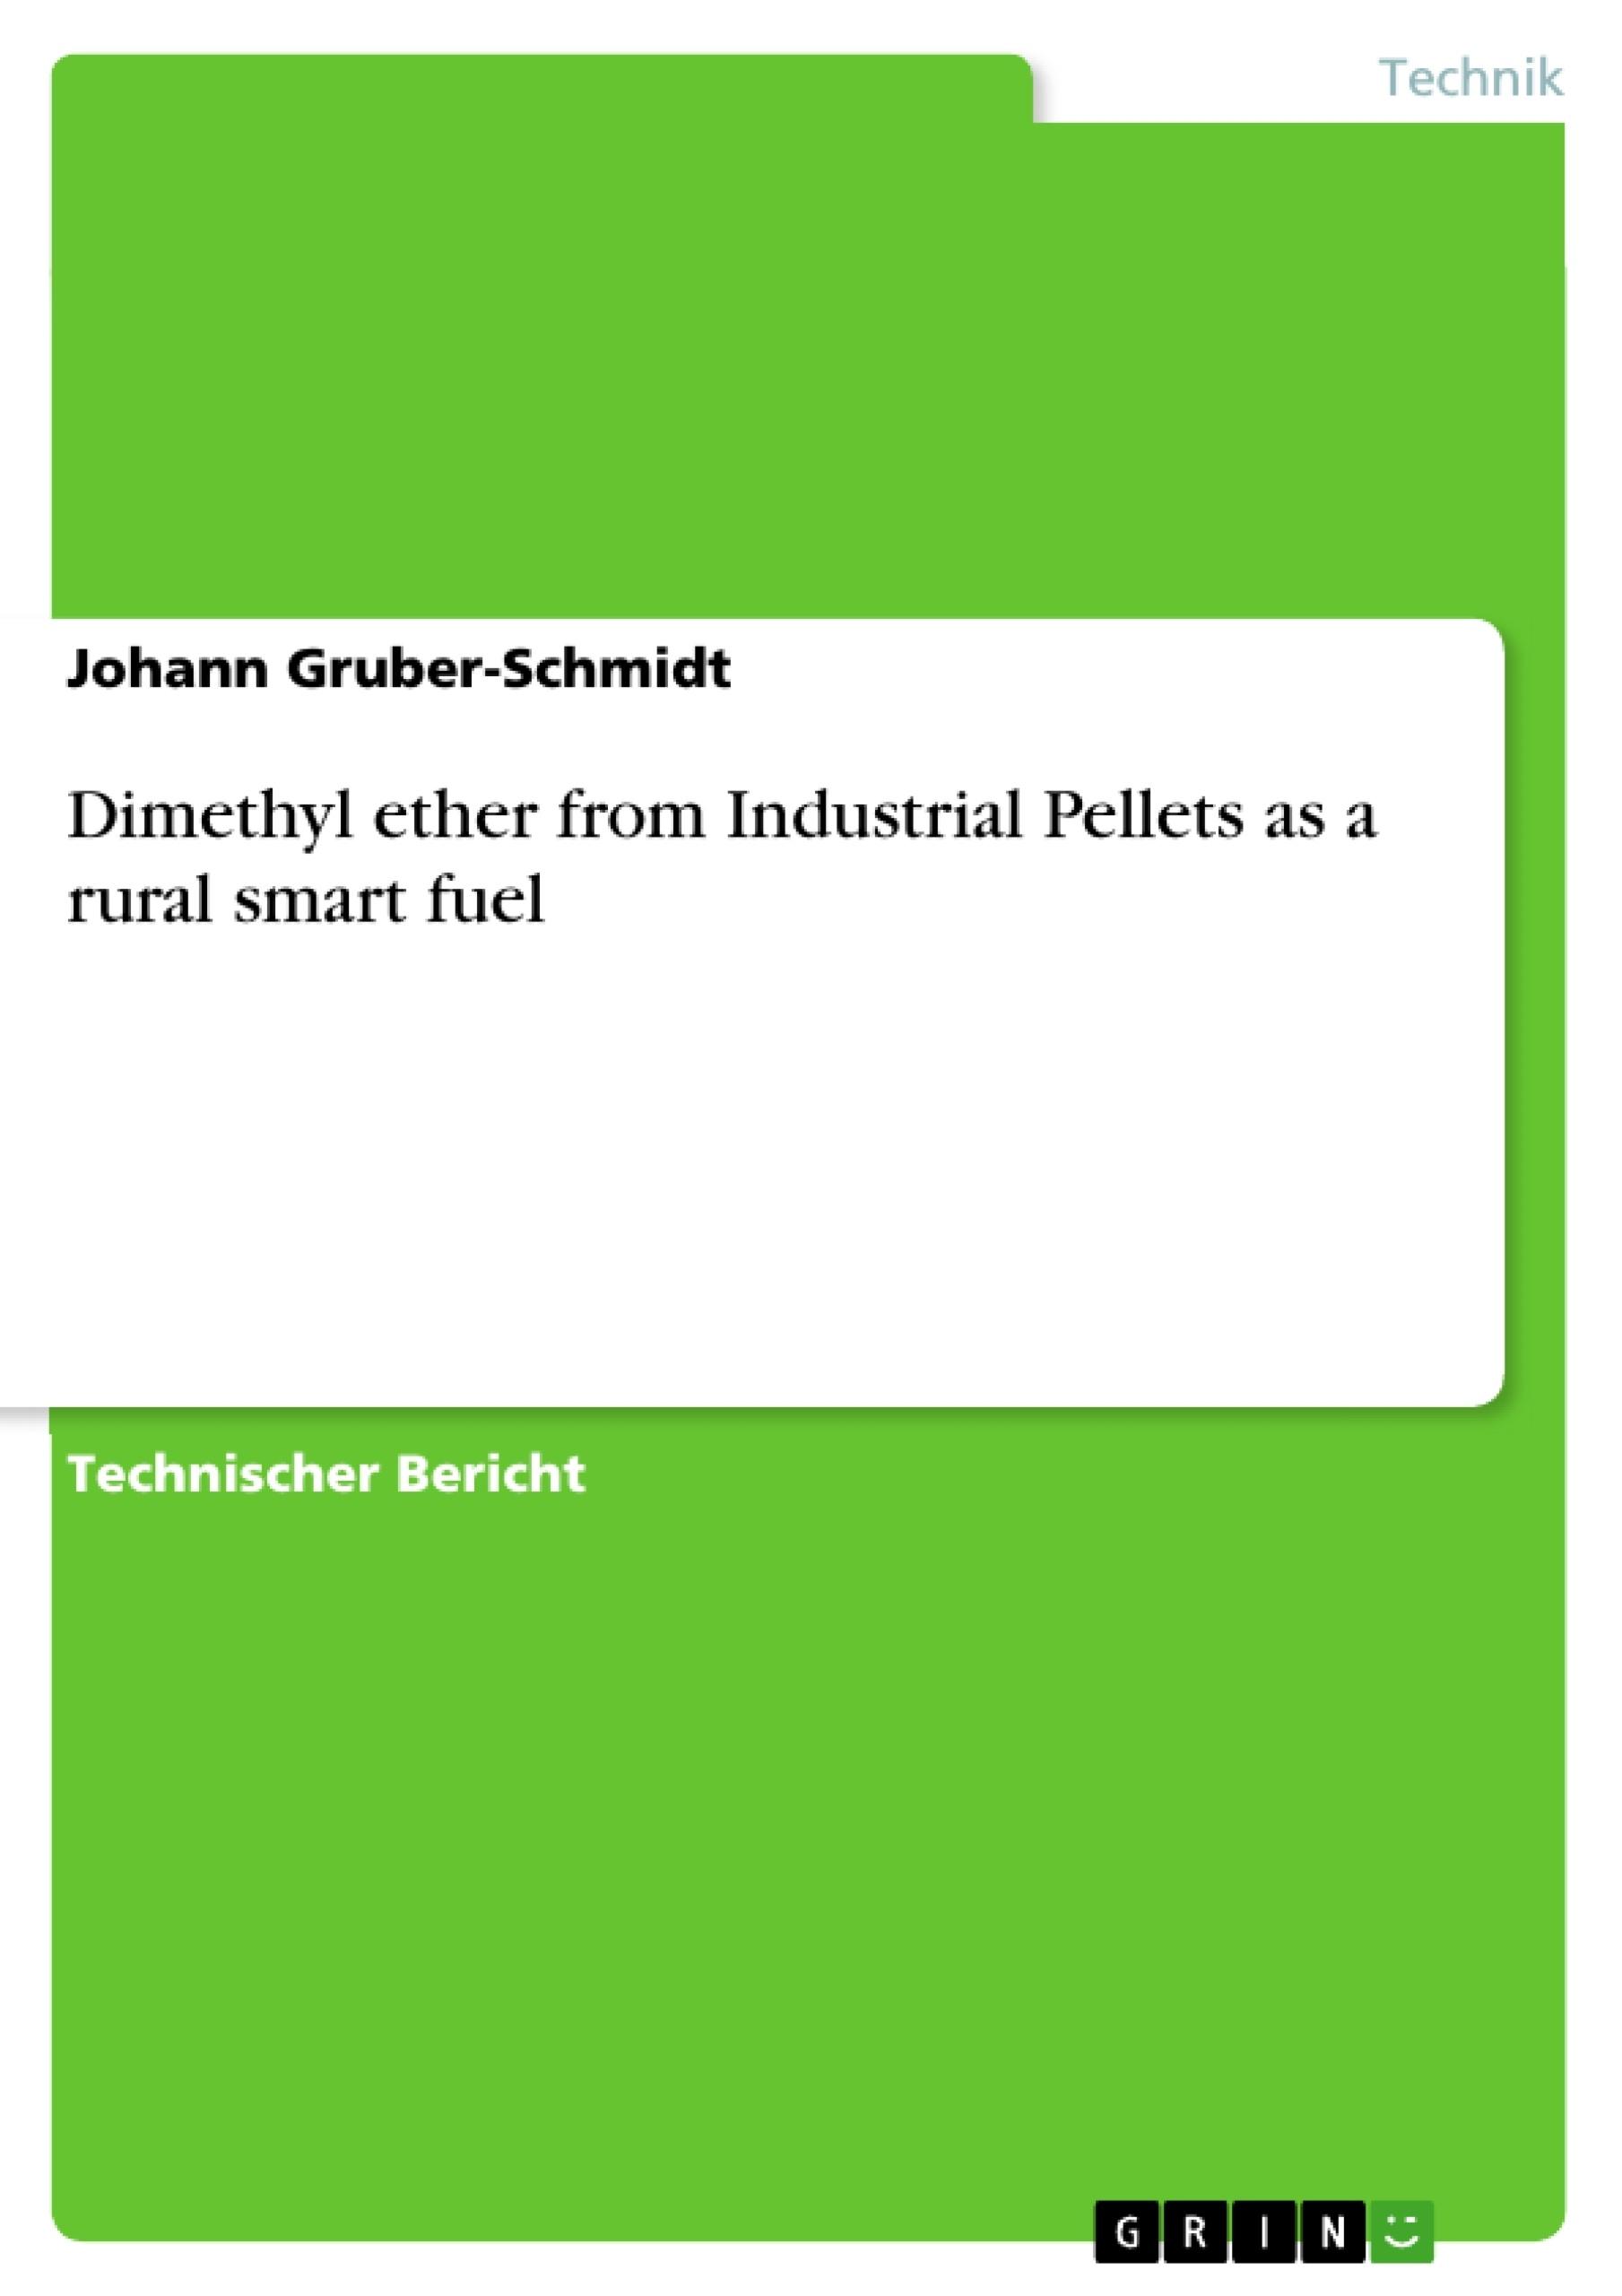 Titel: Dimethyl ether from Industrial Pellets as a rural smart fuel